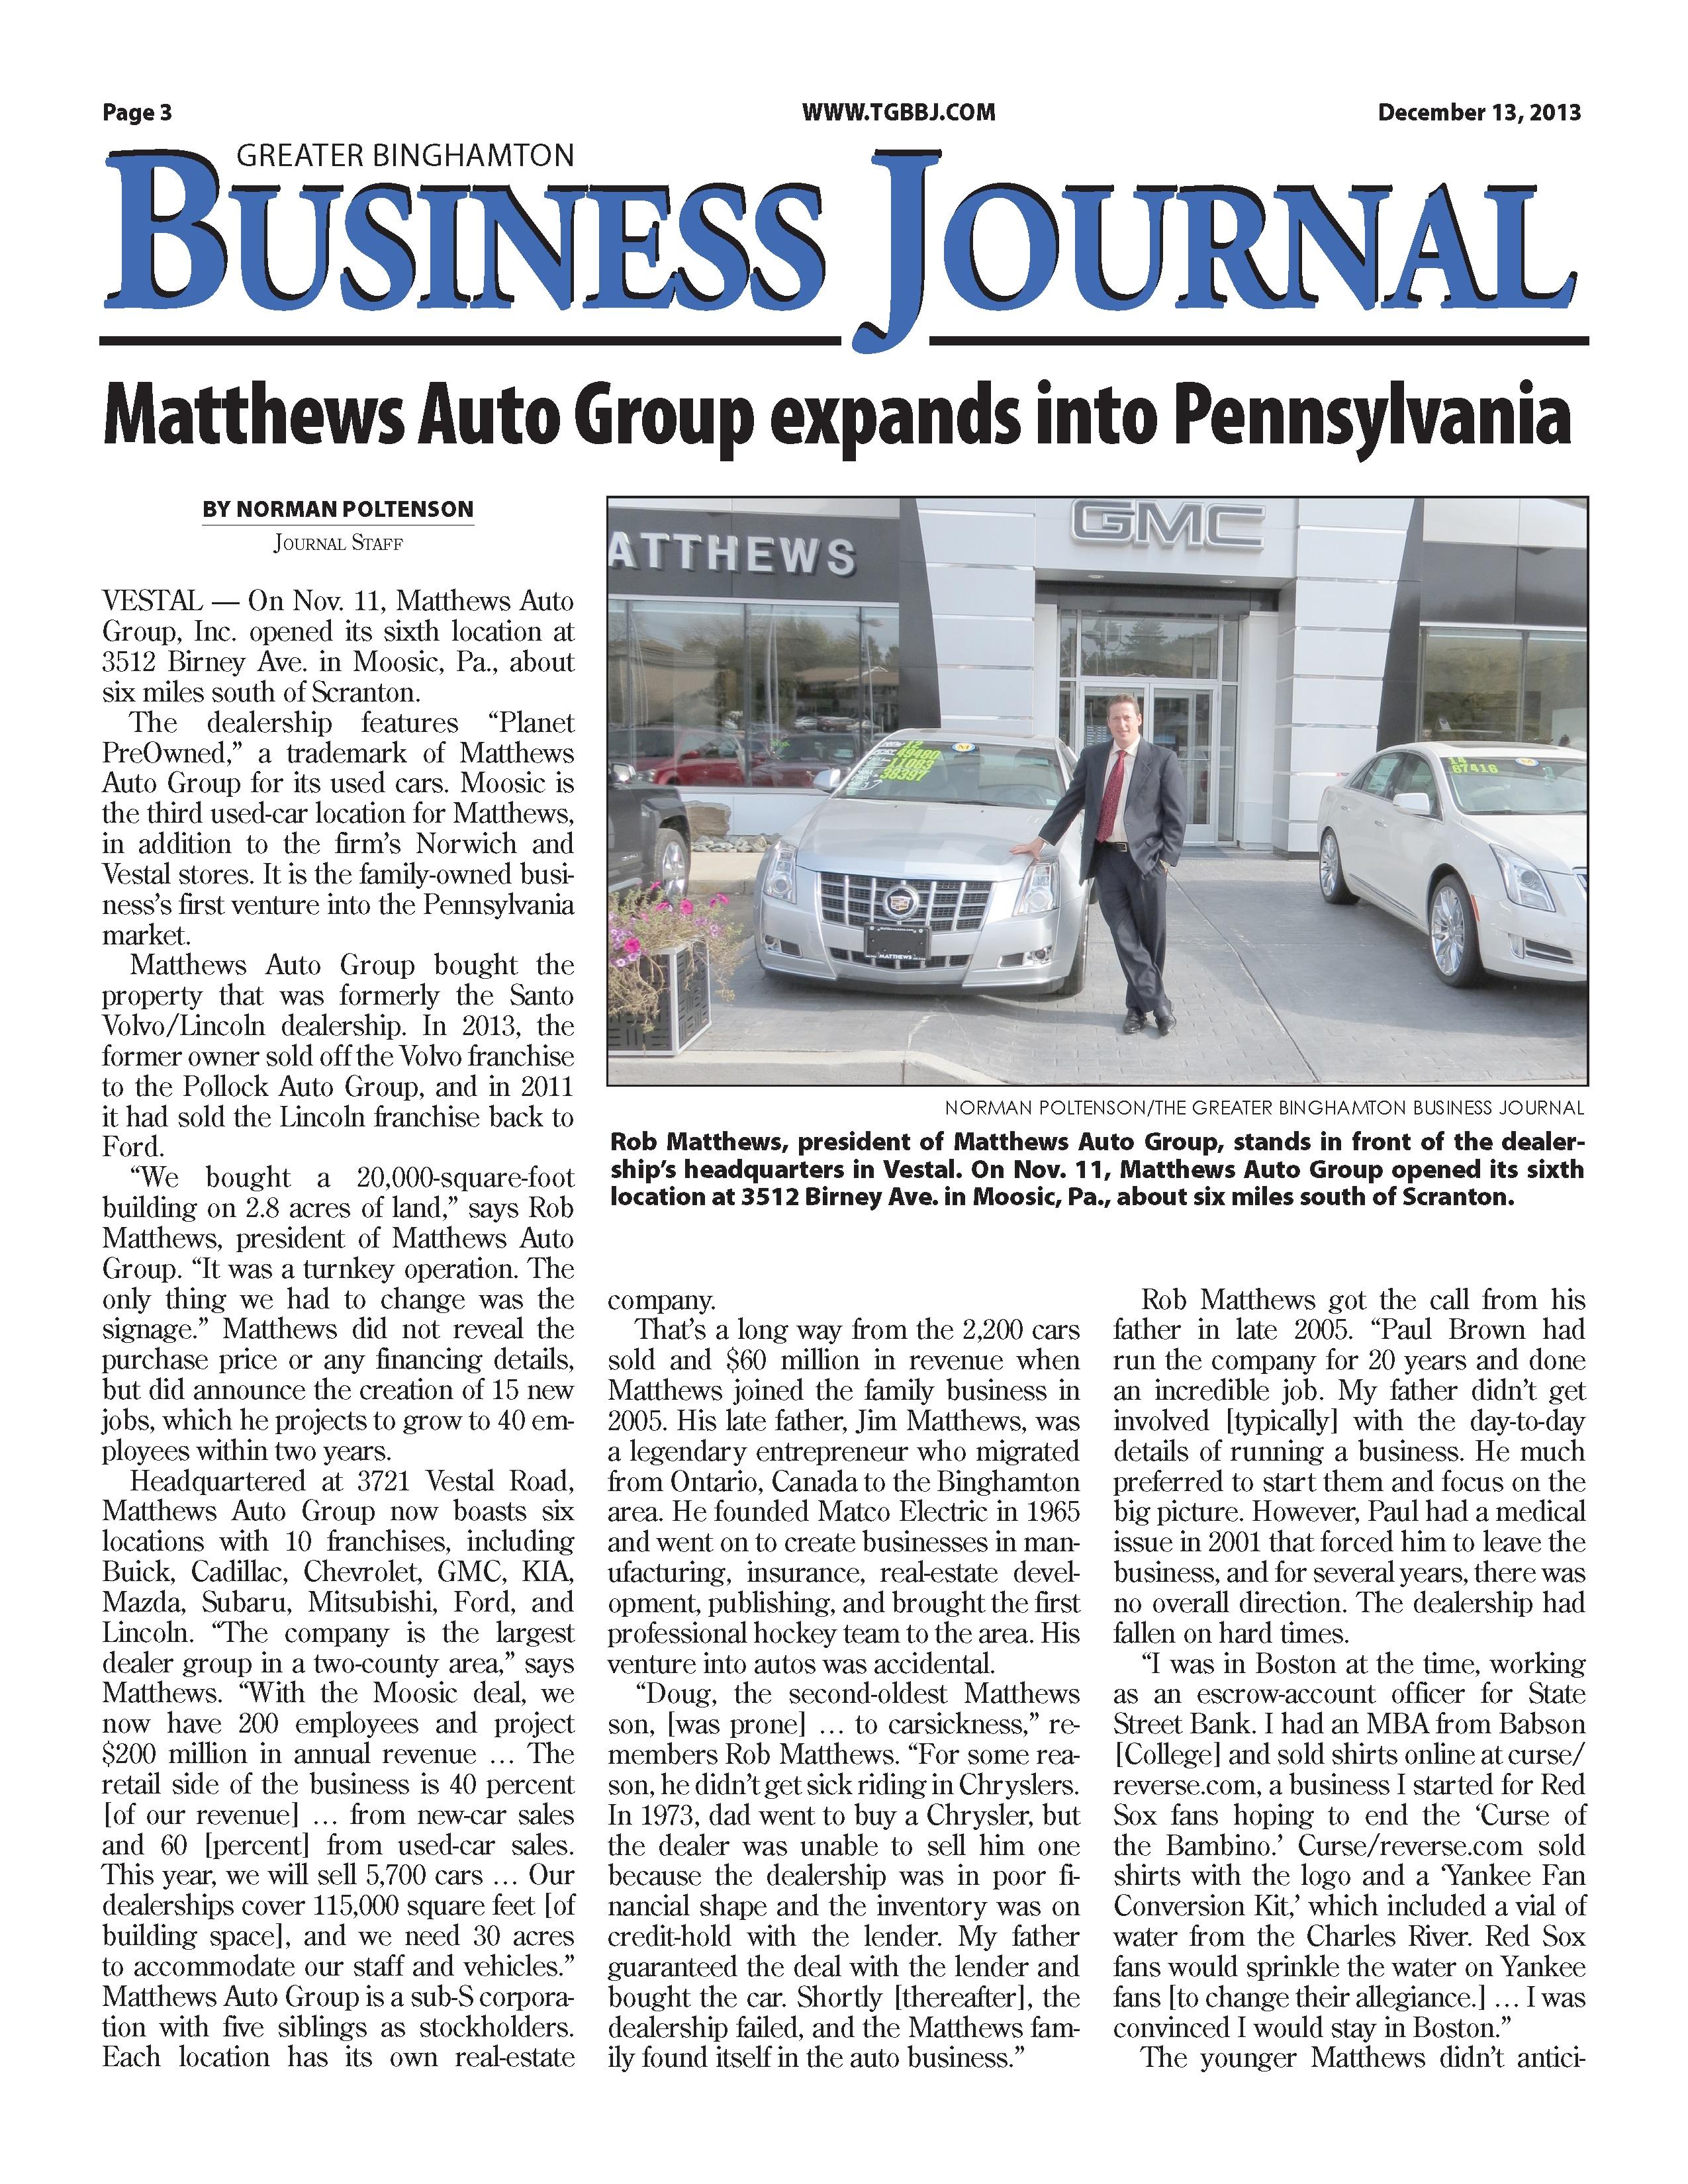 Press Articles Vw Mitsubishi Planet Preowned